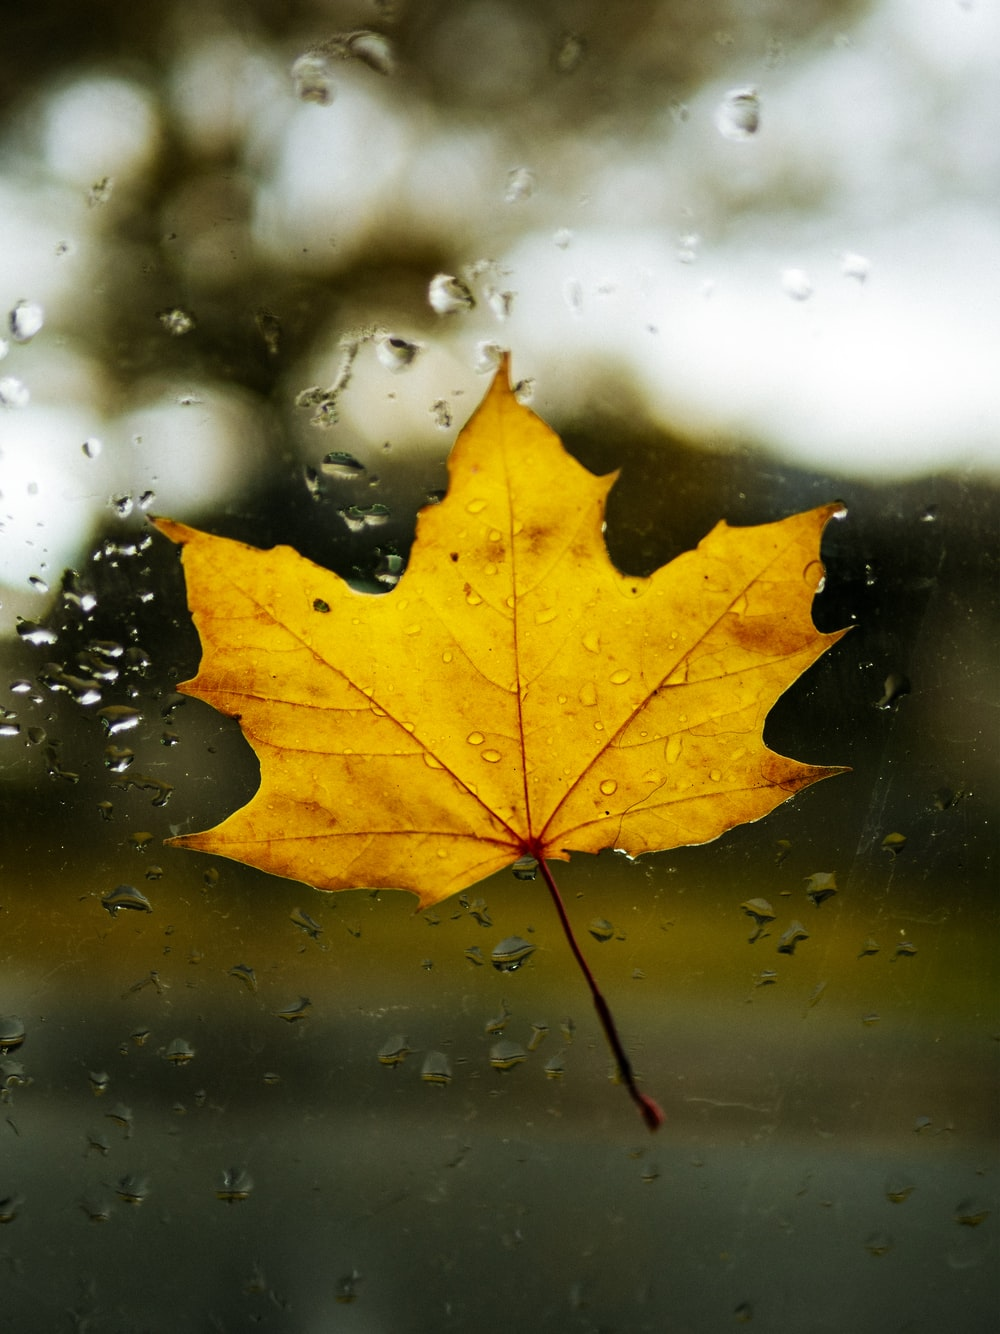 brown leaf on clear glass